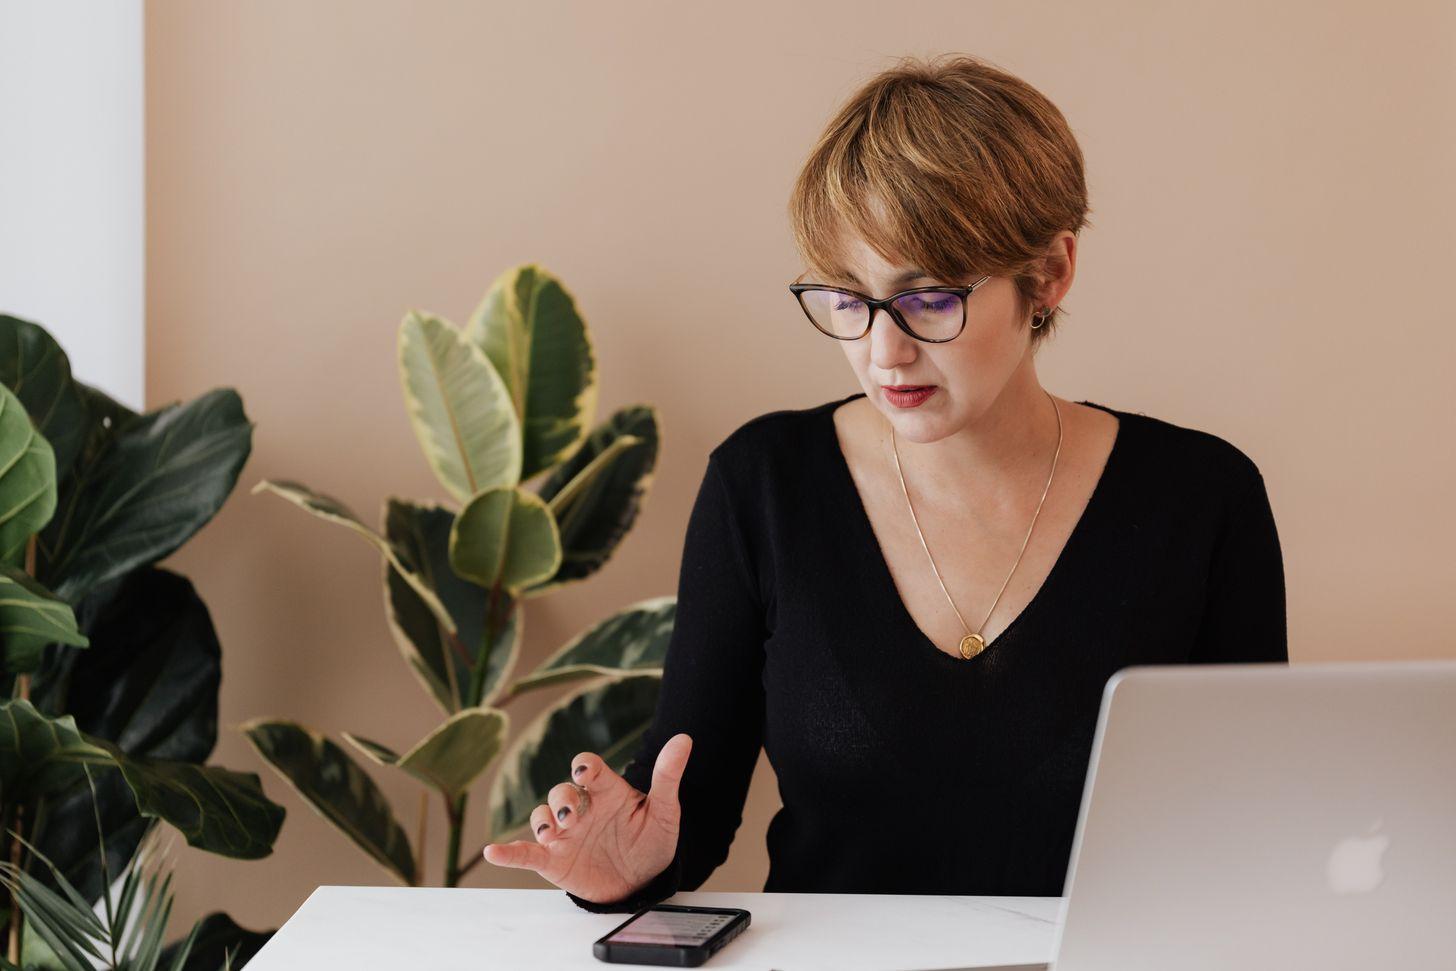 calculating price woman laptop.jpg